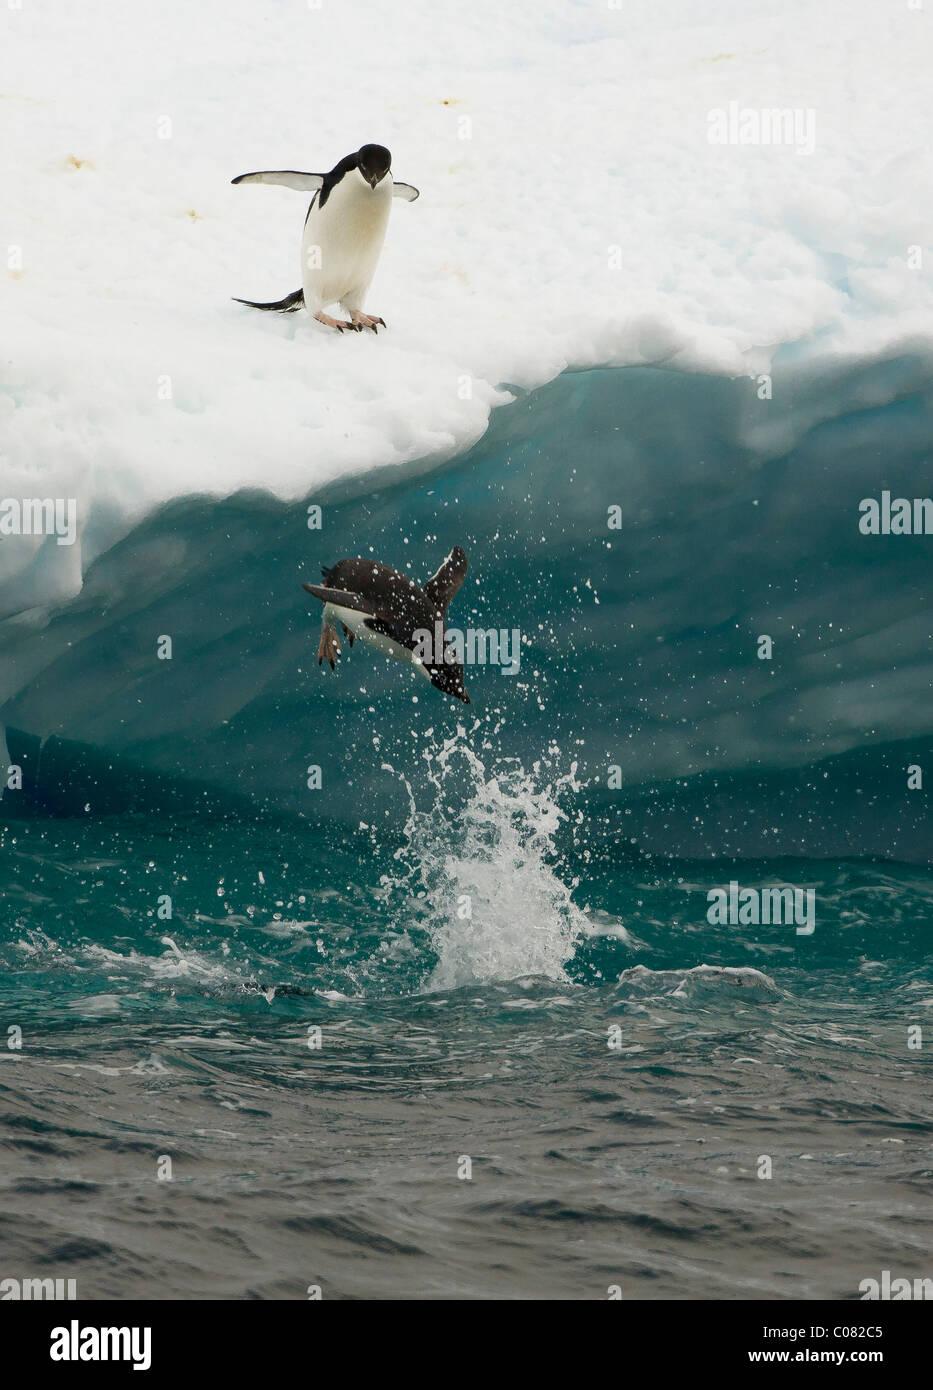 Adelie Penguin diving off ice floe, Paulet Island, Antarctica Peninsula - Stock Image